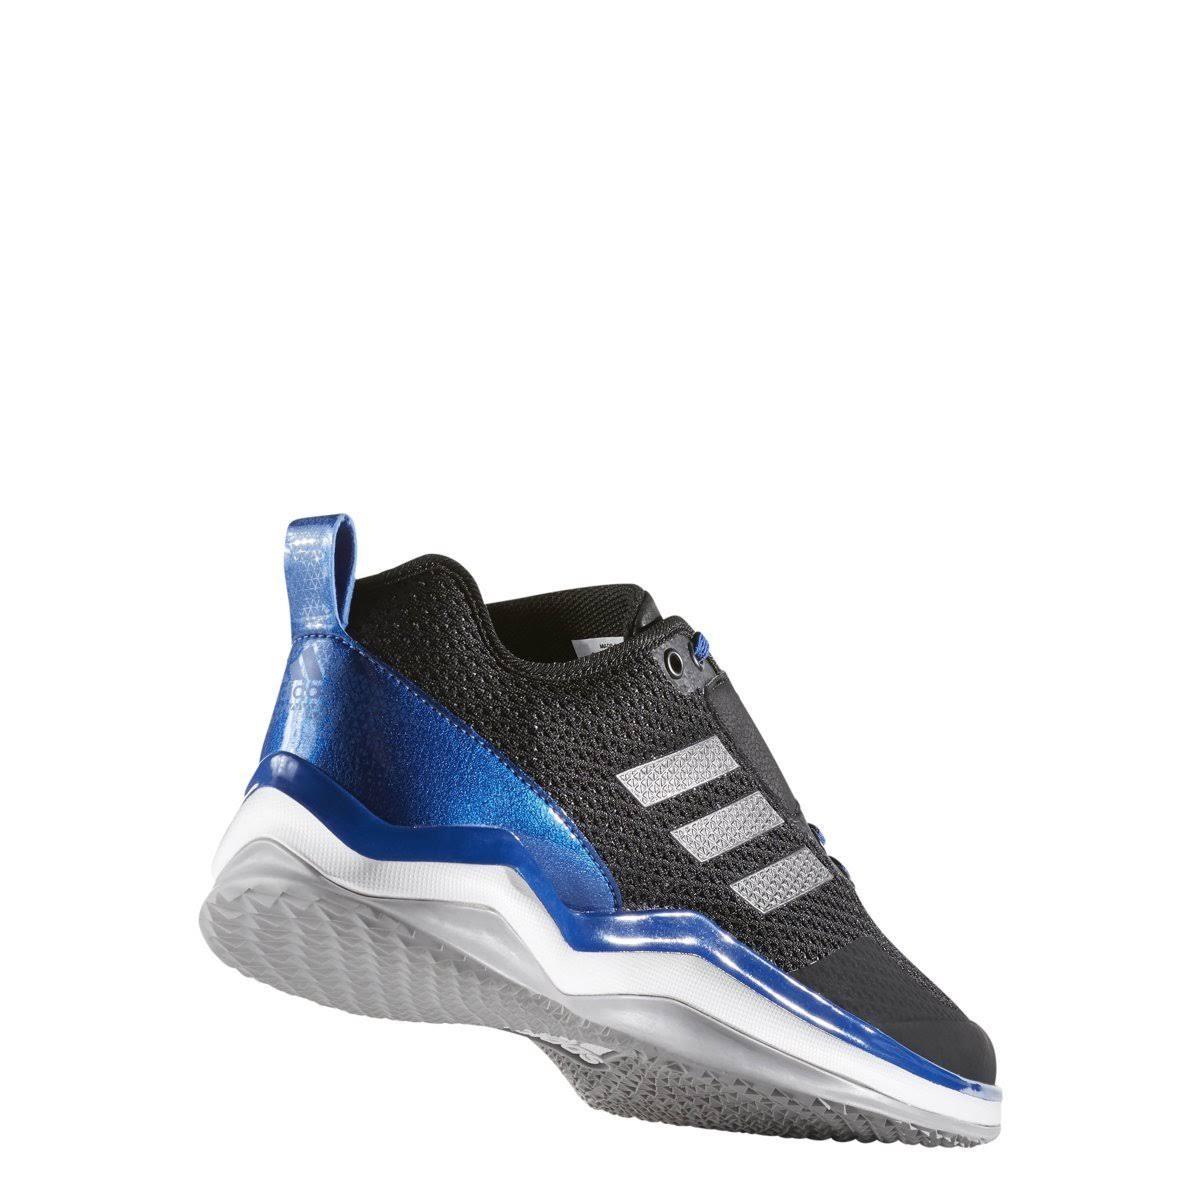 Para Q16540 12 Tacos De Speed trainer Hombre Béisbol 0 Adidas Tamaño 3 zqR0wIP